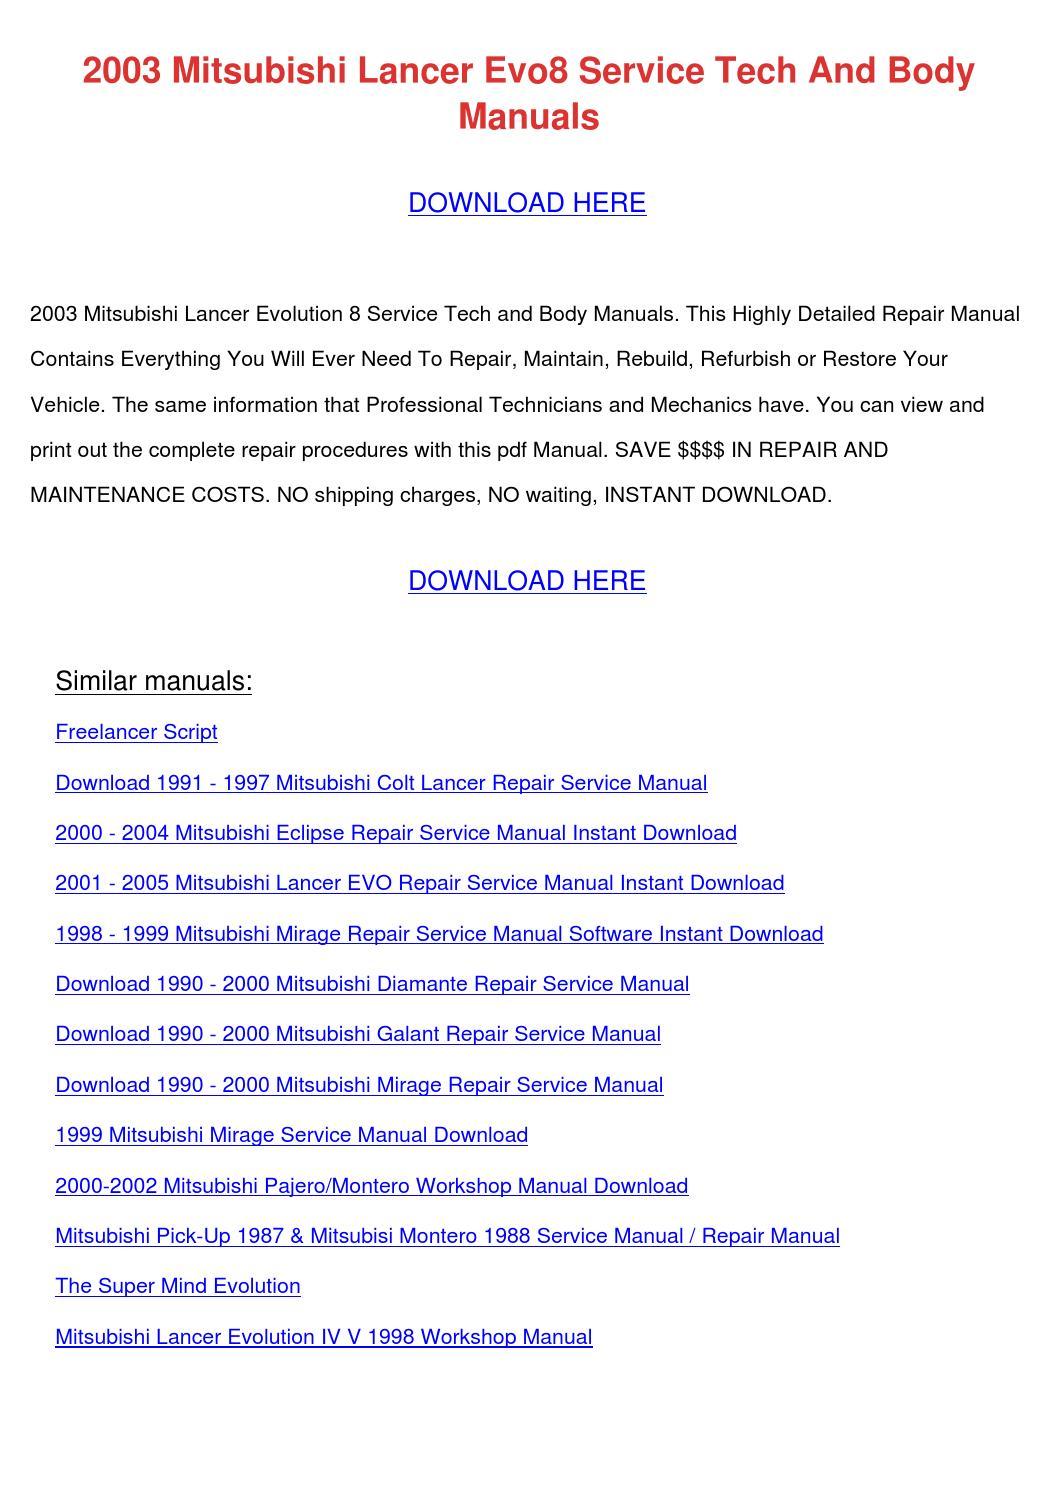 2003 Mitsubishi Lancer Evo8 Service Tech And by MilfordMueller - issuu